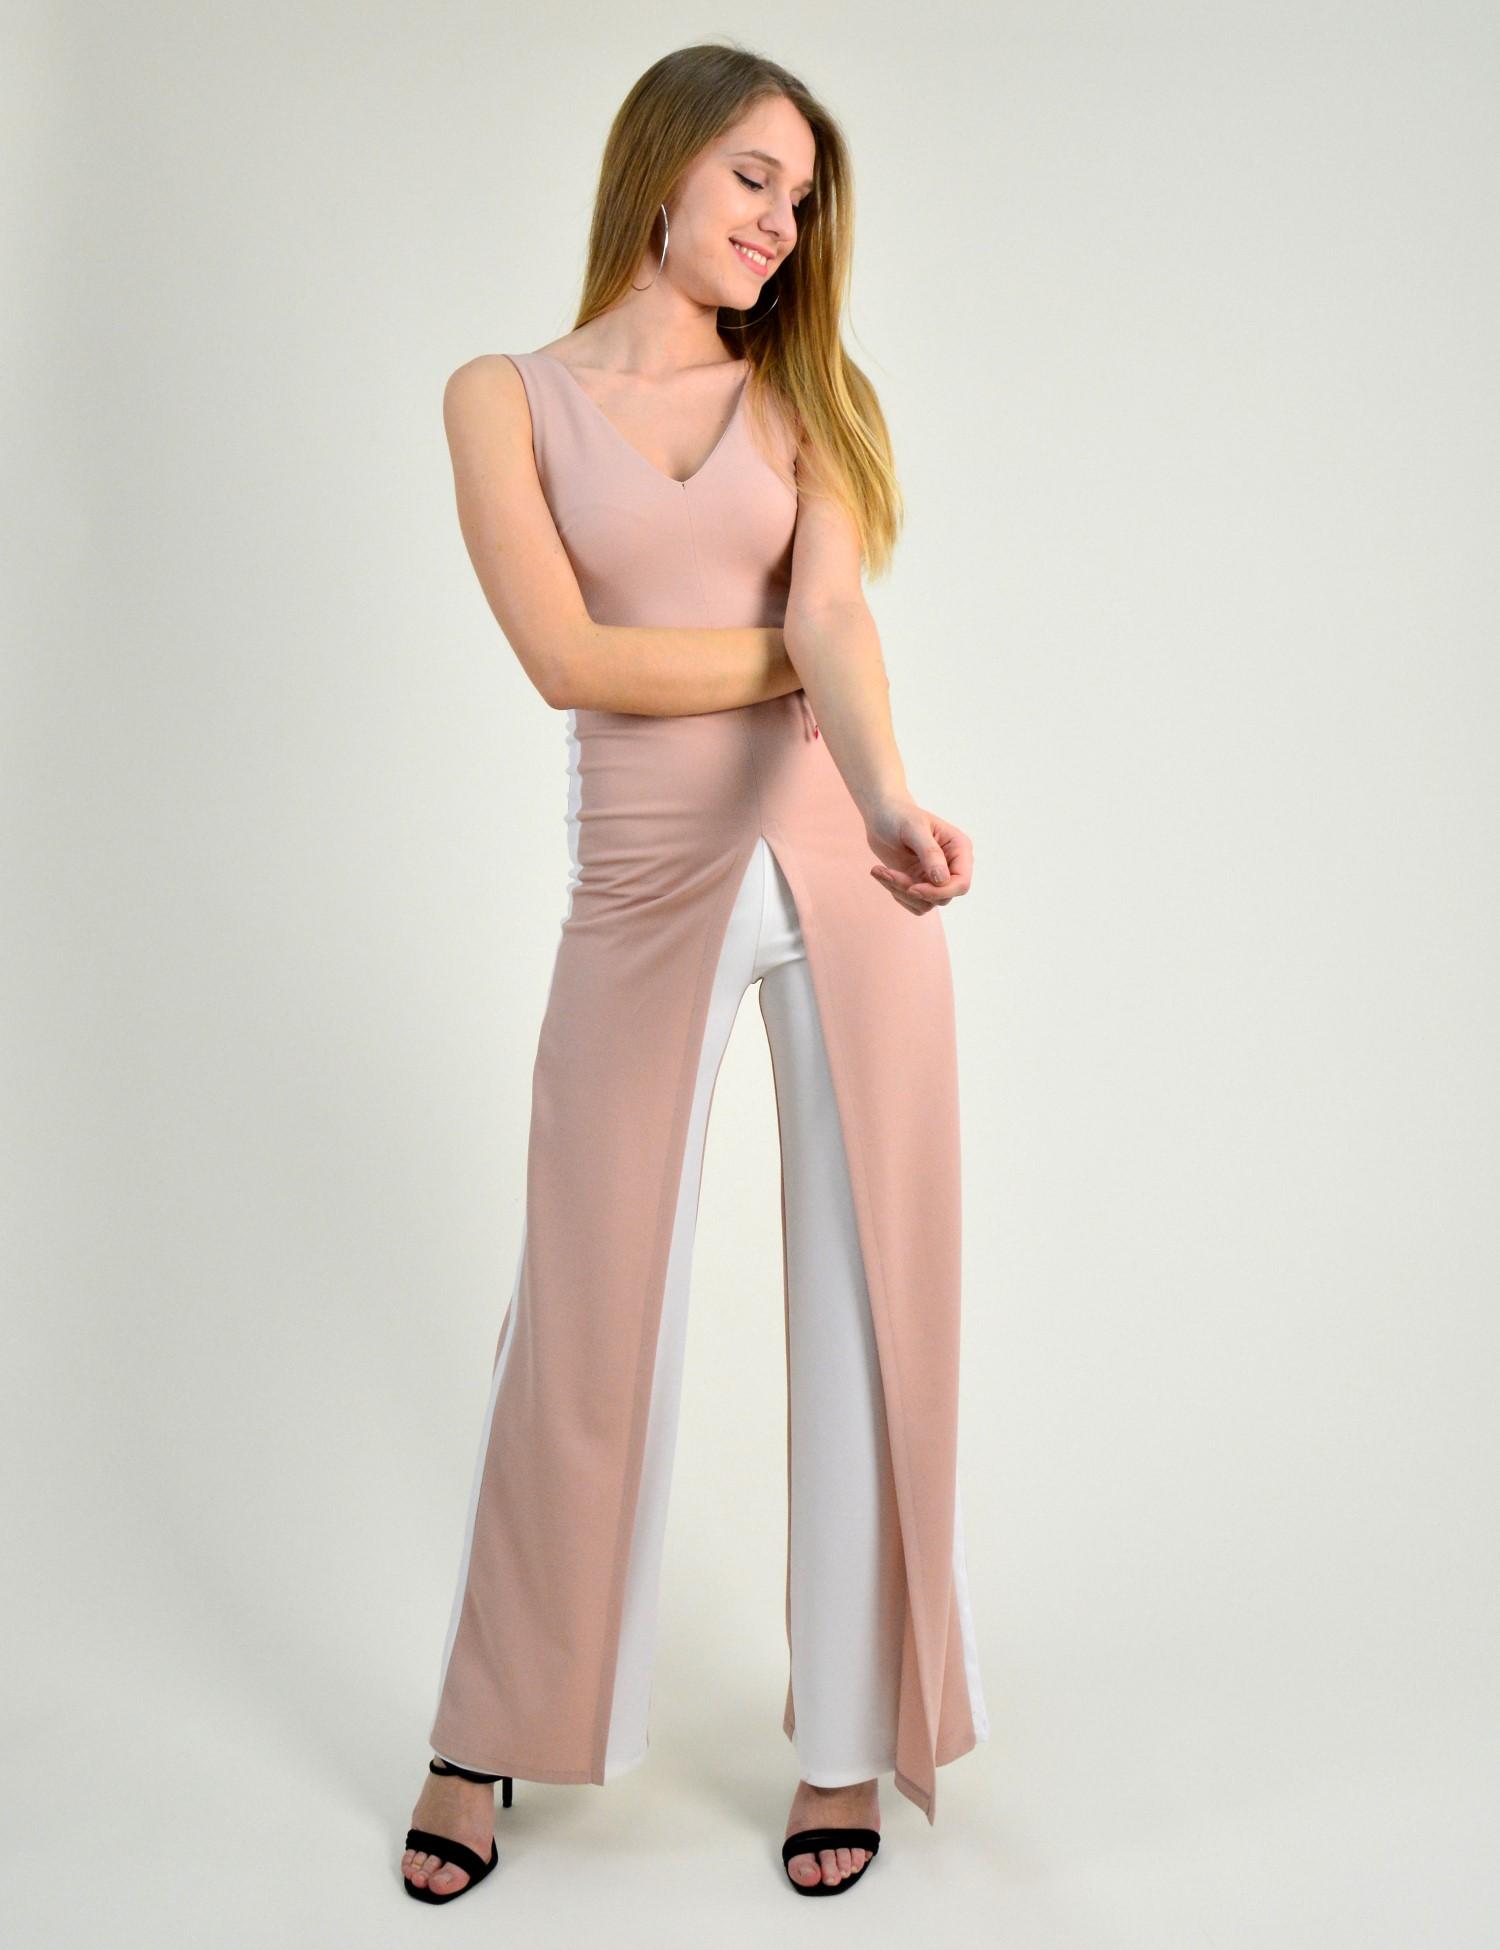 9bbc7676a2fb Γυναικεία ολόσωμη φόρμα αμάνικη ρίγα στο πλάι ροζ 014009005